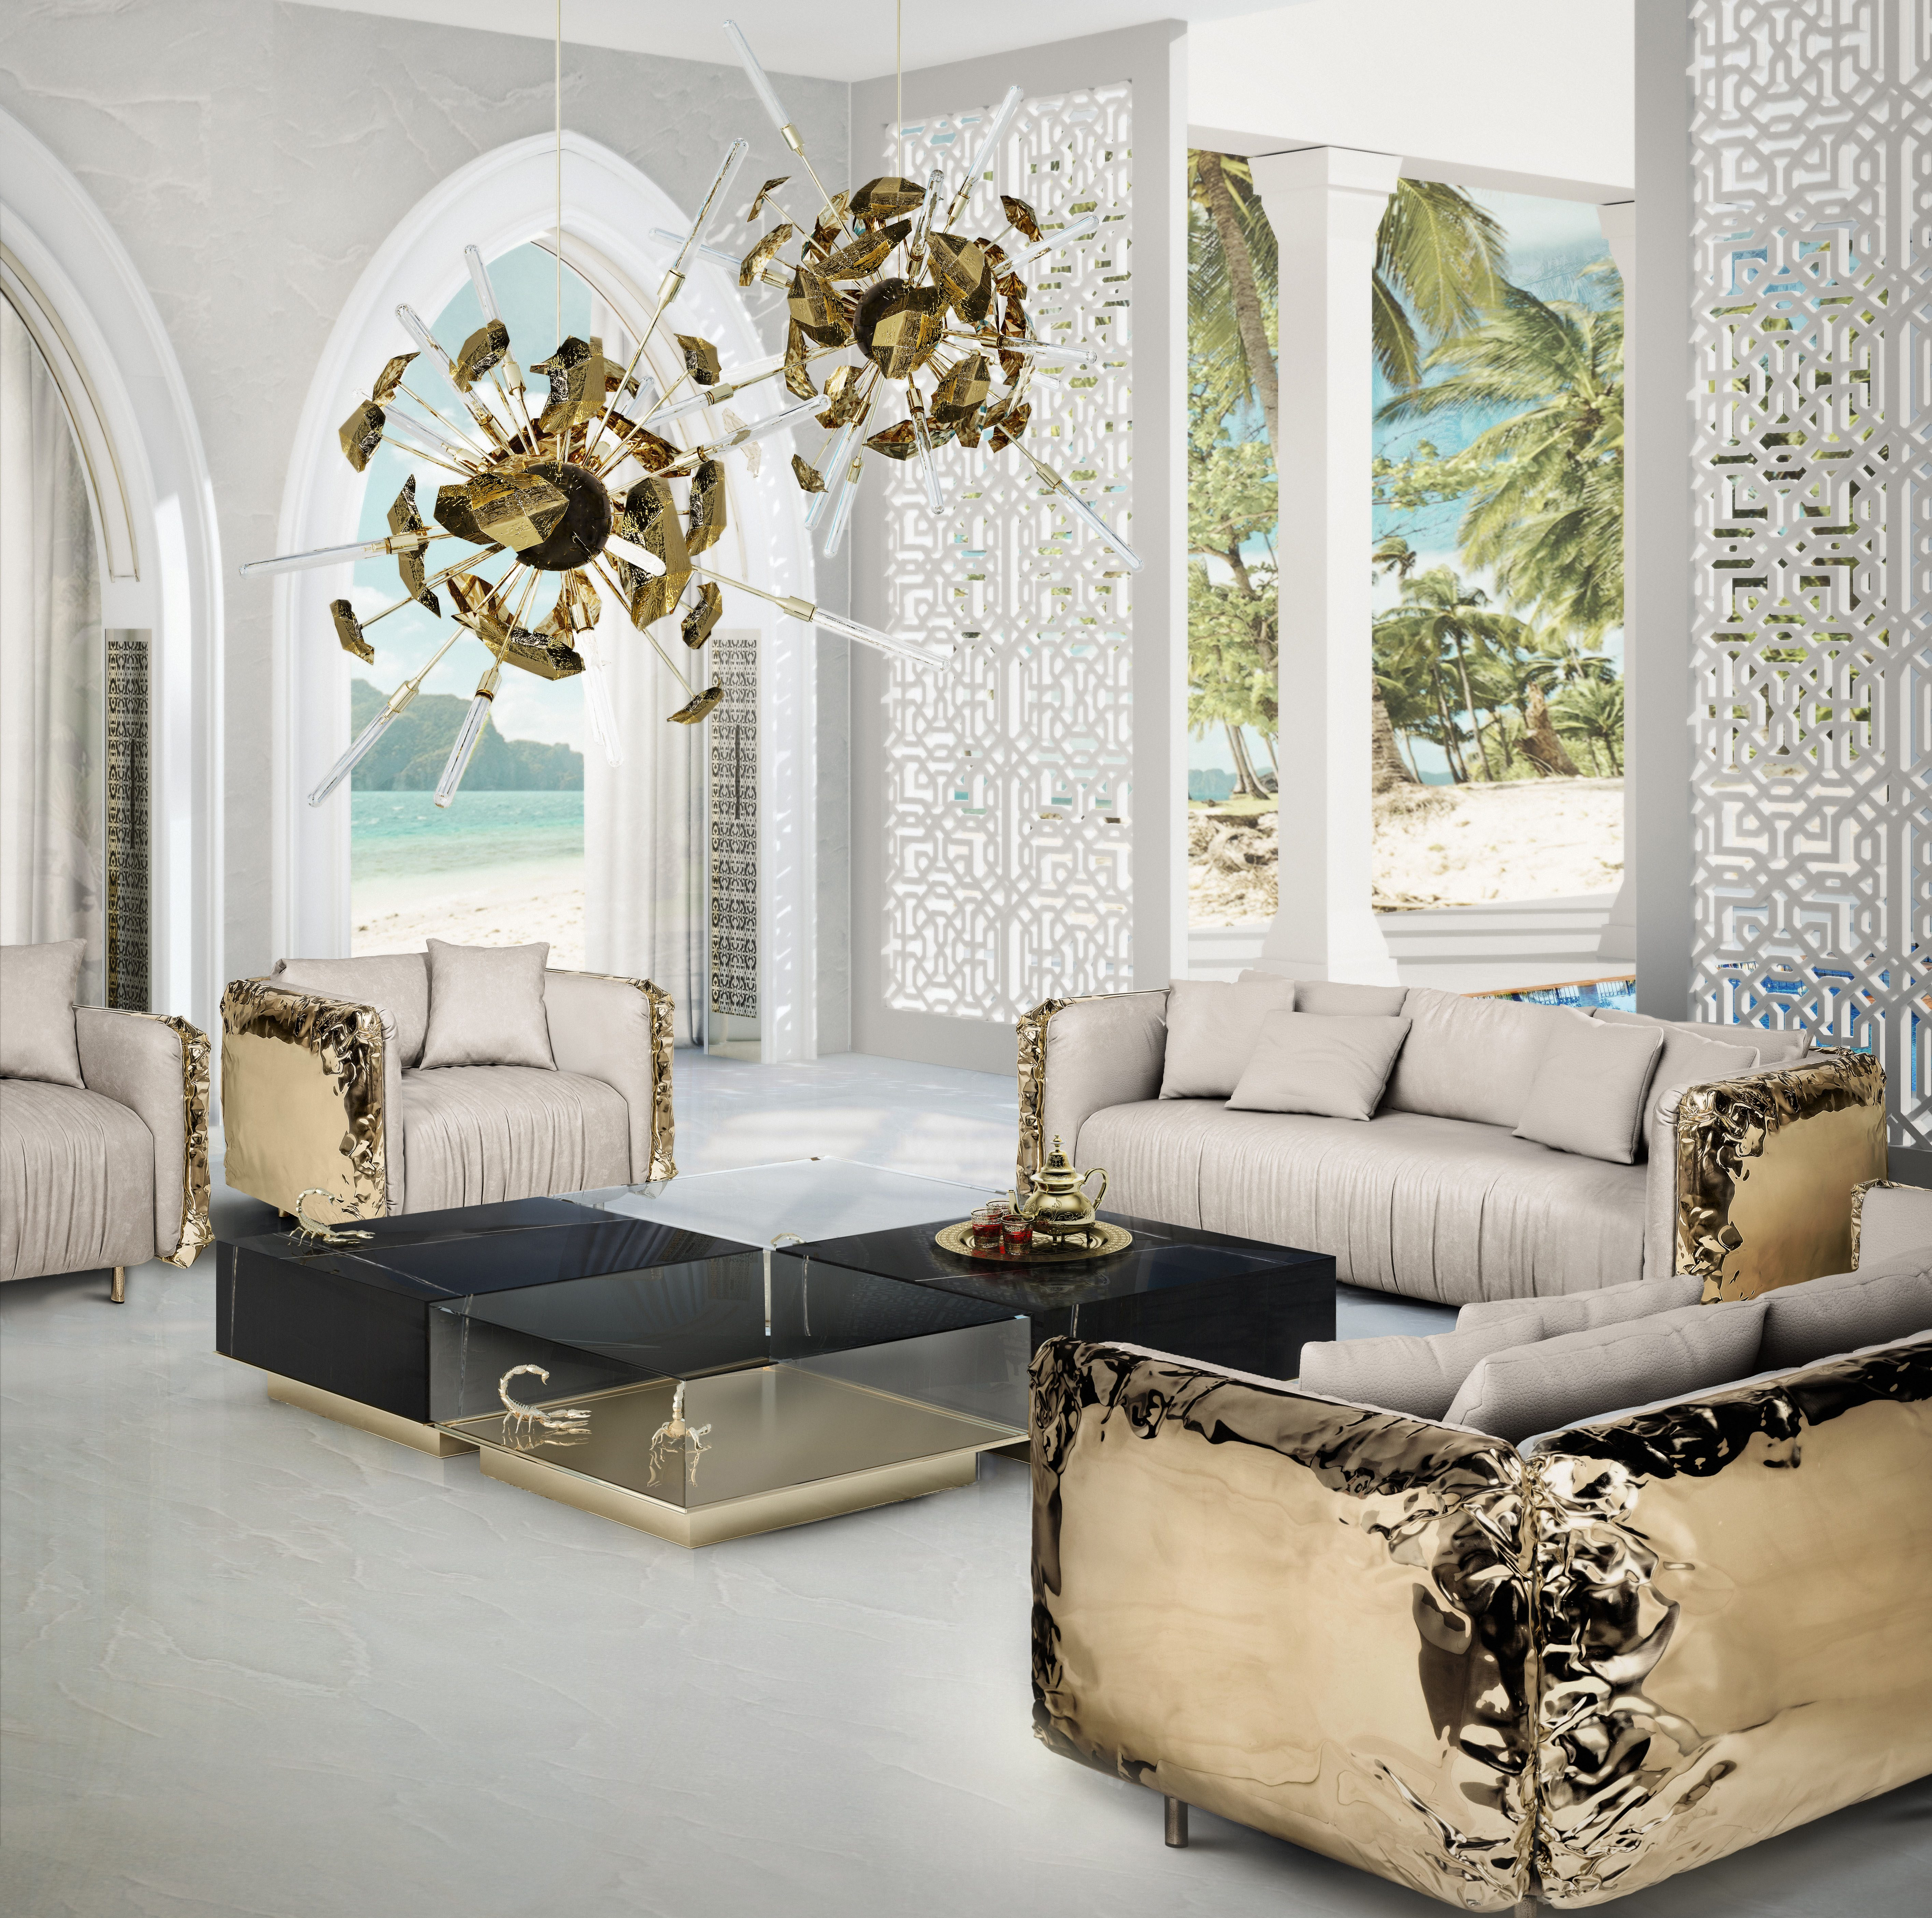 living-room-furniture-design-ideas-by-bocadolobo